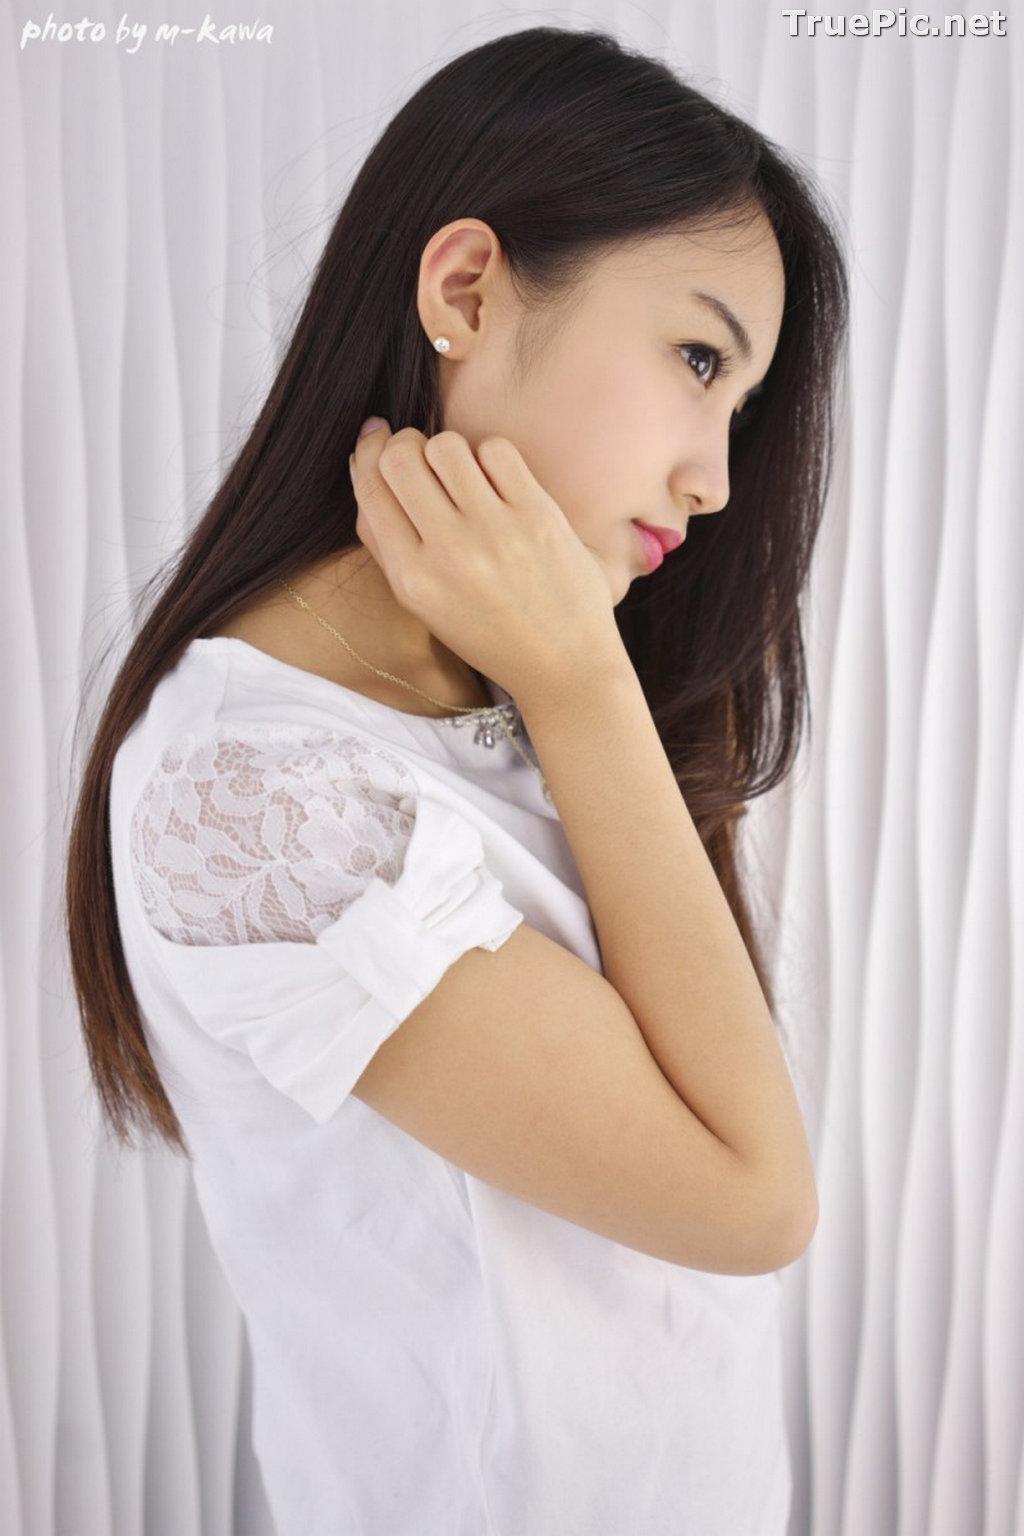 Image Japanese Actress and Model – Hikari Kuroki (黒木ひかり) – Sexy Picture Collection 2021 - TruePic.net - Picture-9